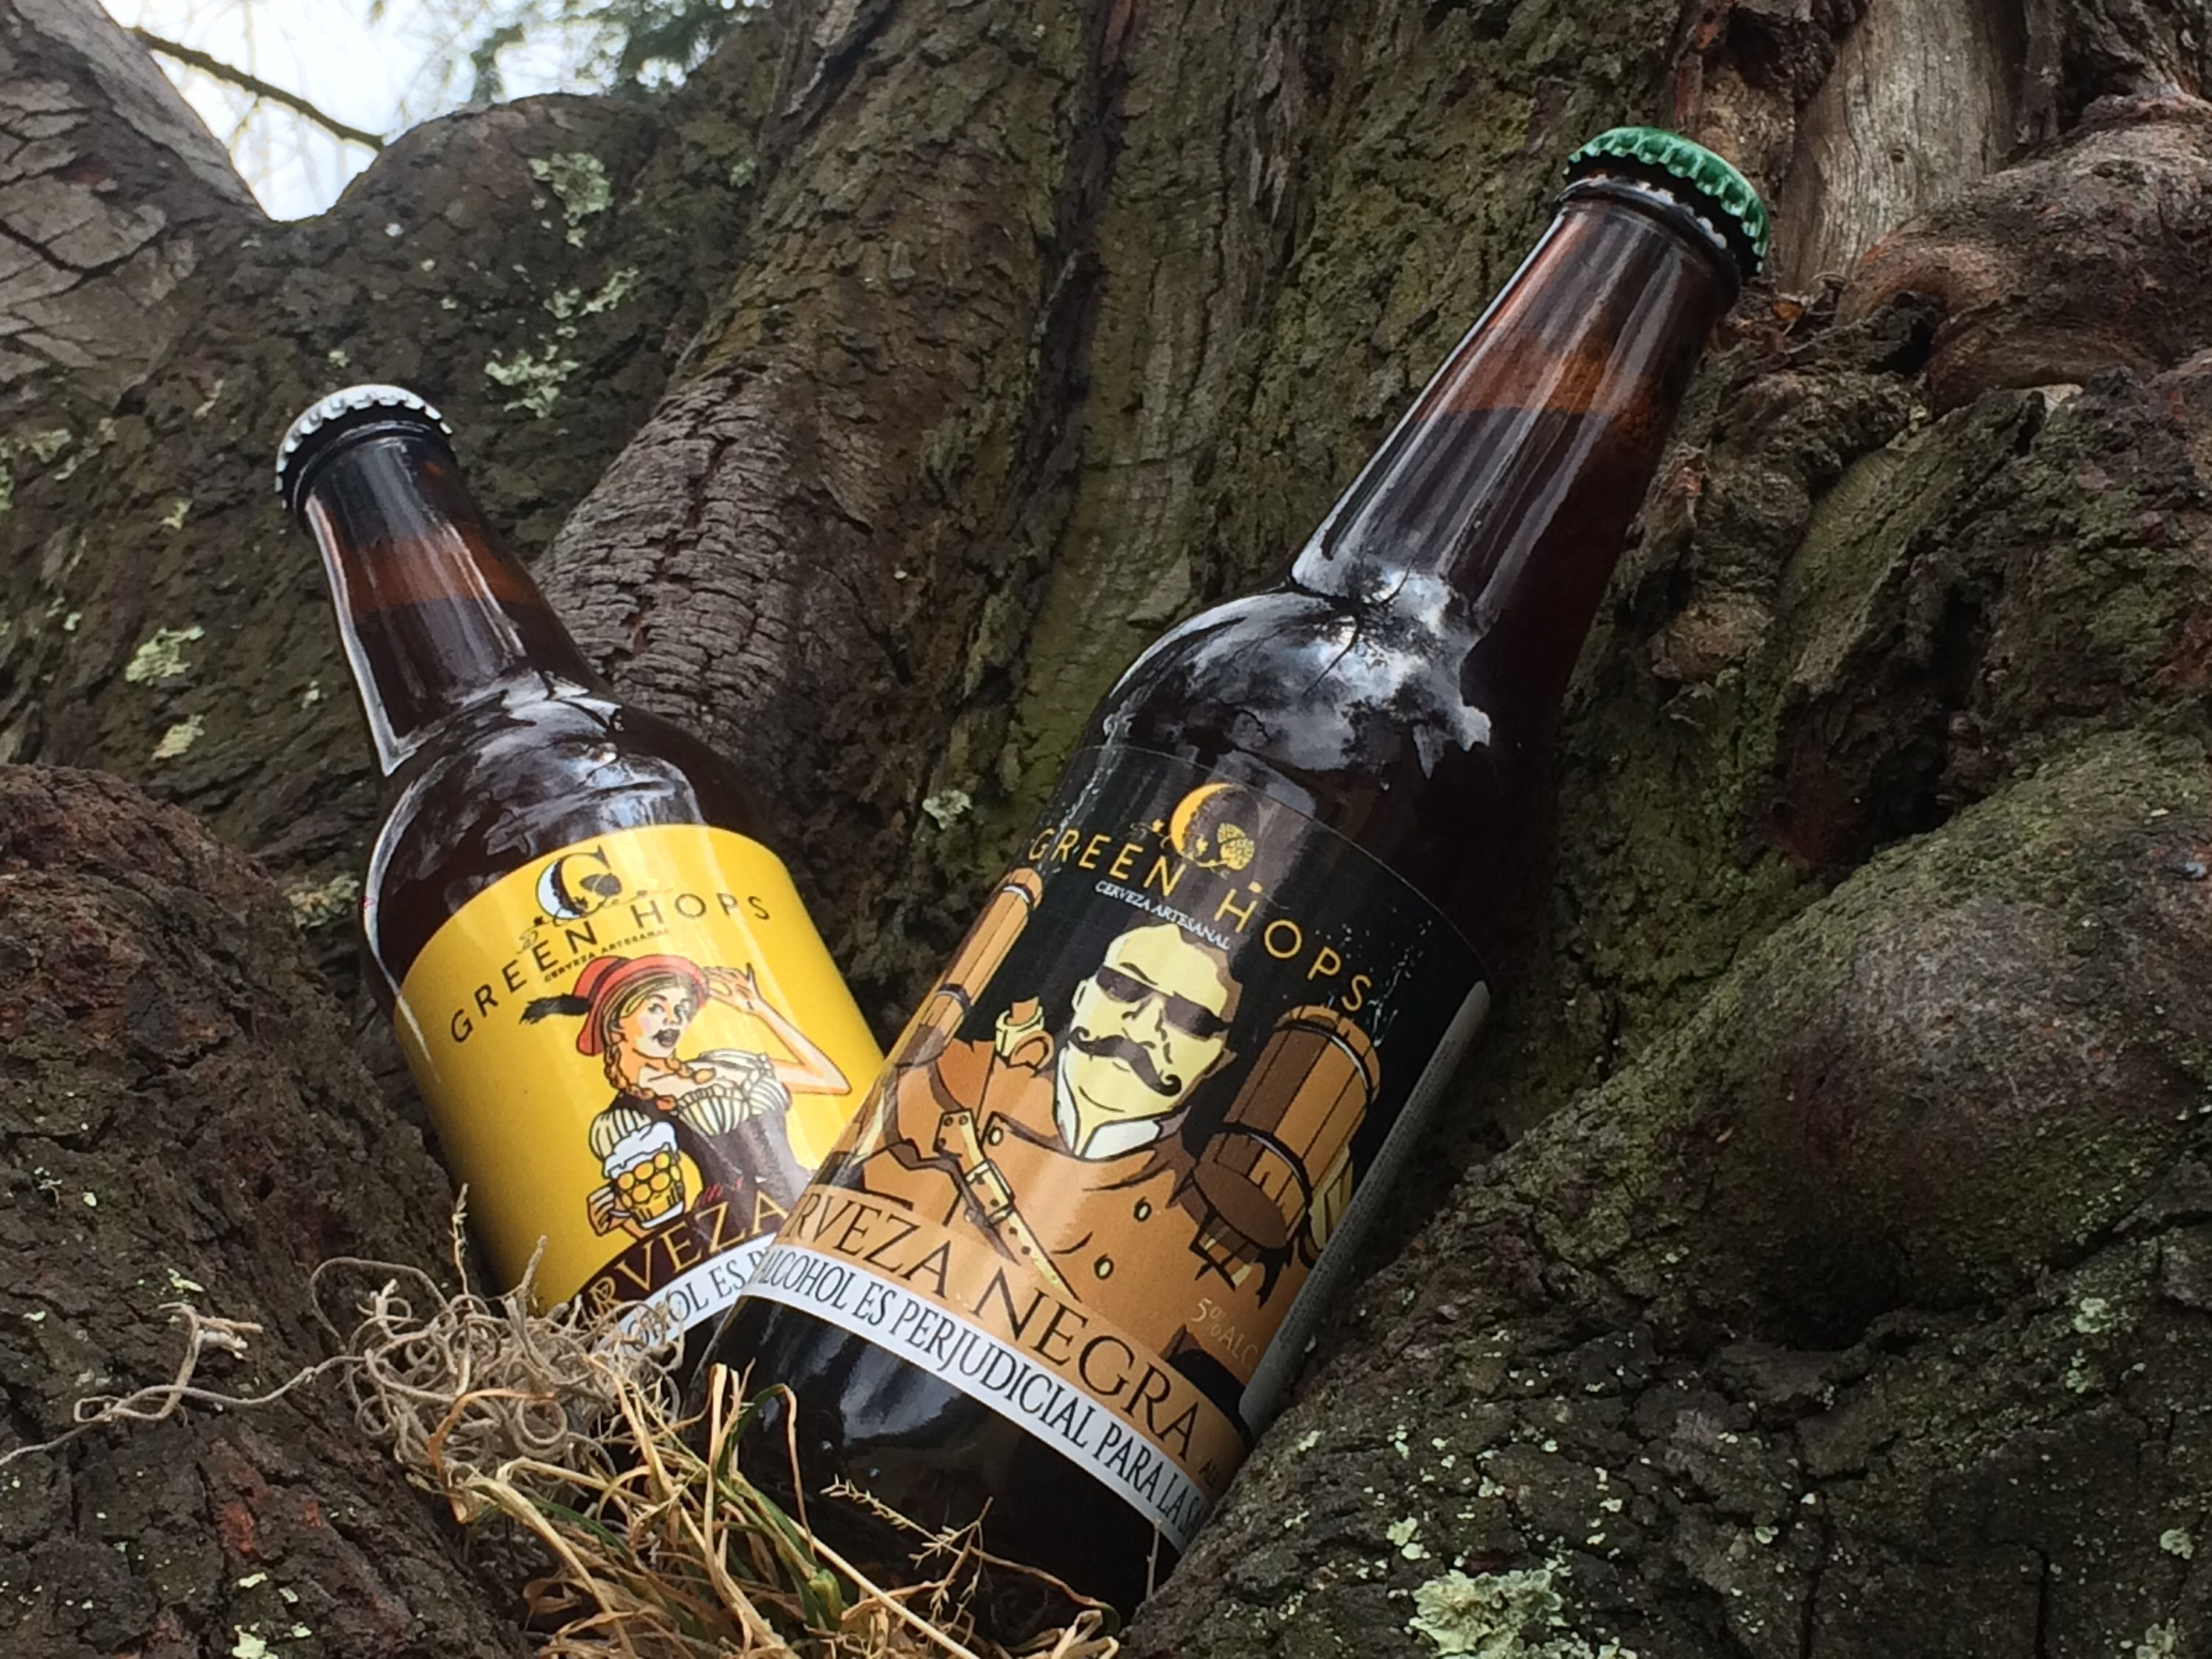 Idea De Green Hops Beer En Green Hops Beer Cerveza Artesanal